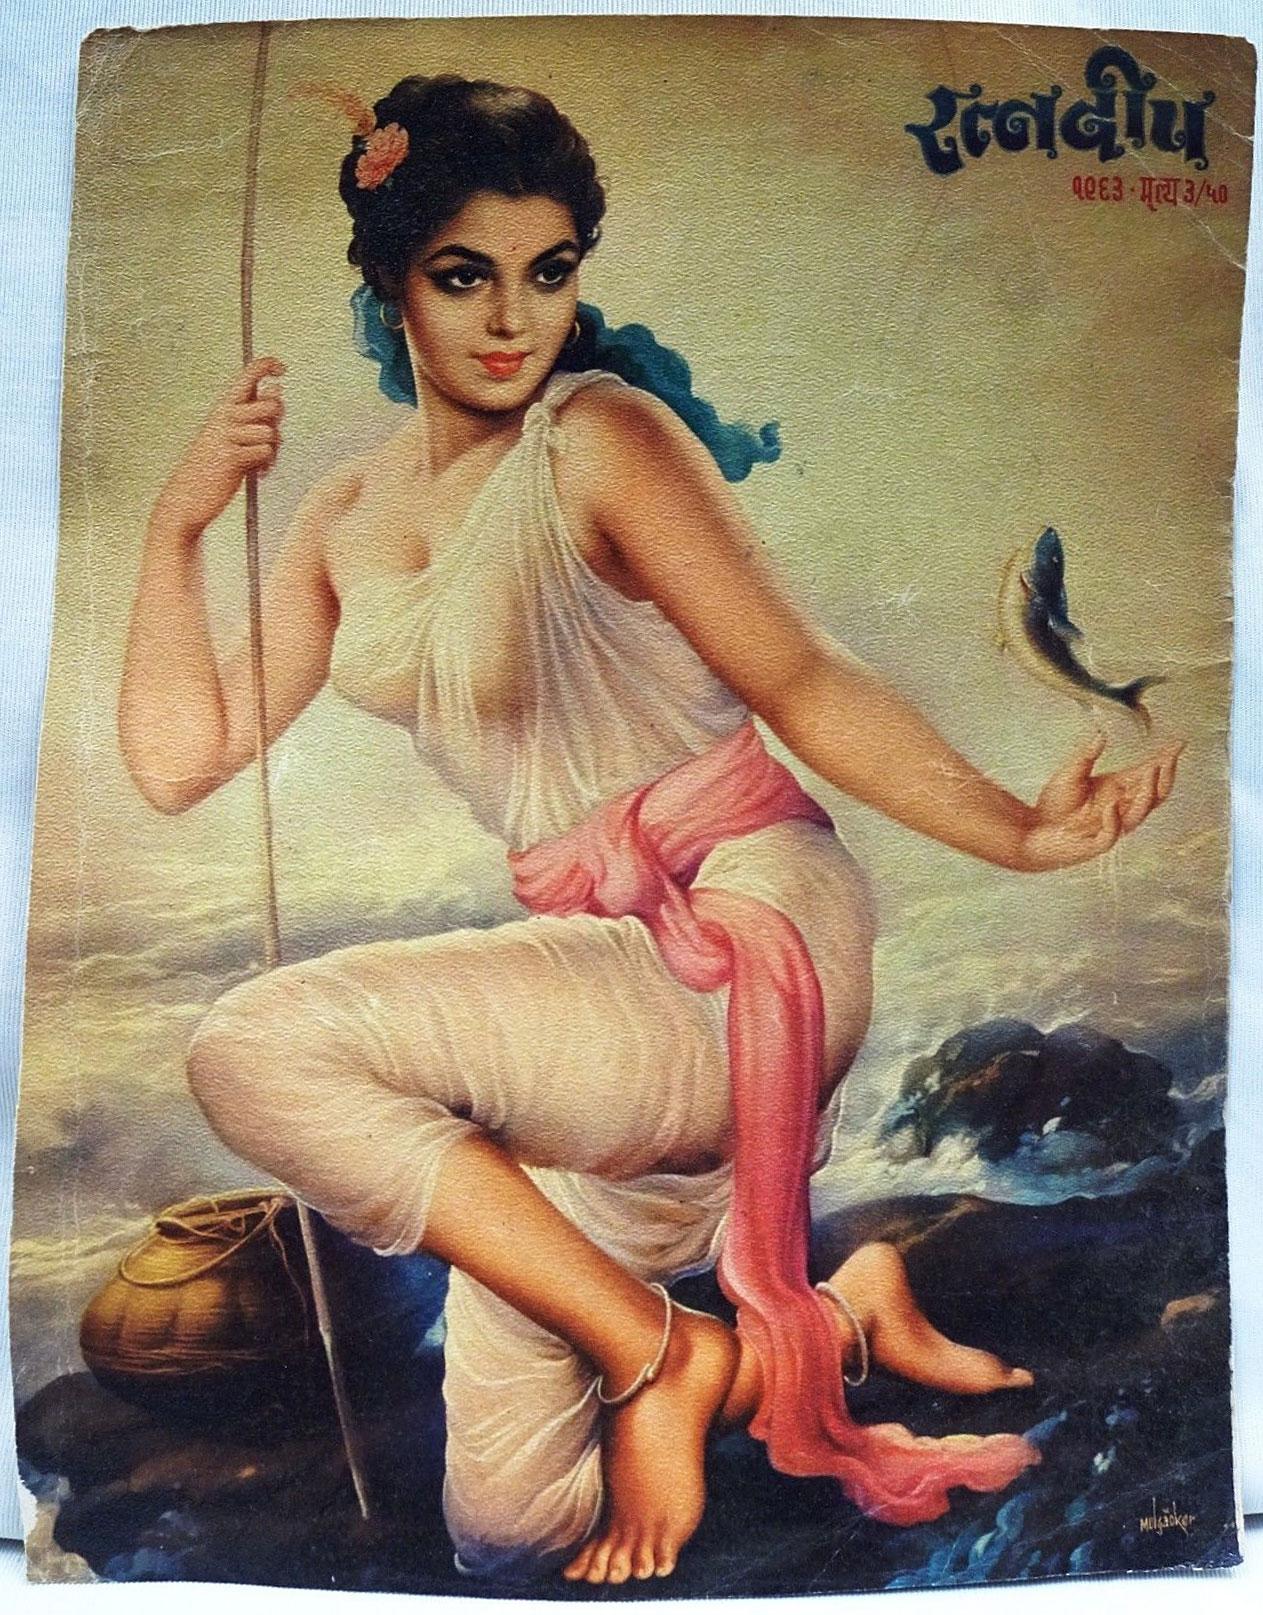 Beautiful Fisherwoman - Vintage Indian Lithograph Print